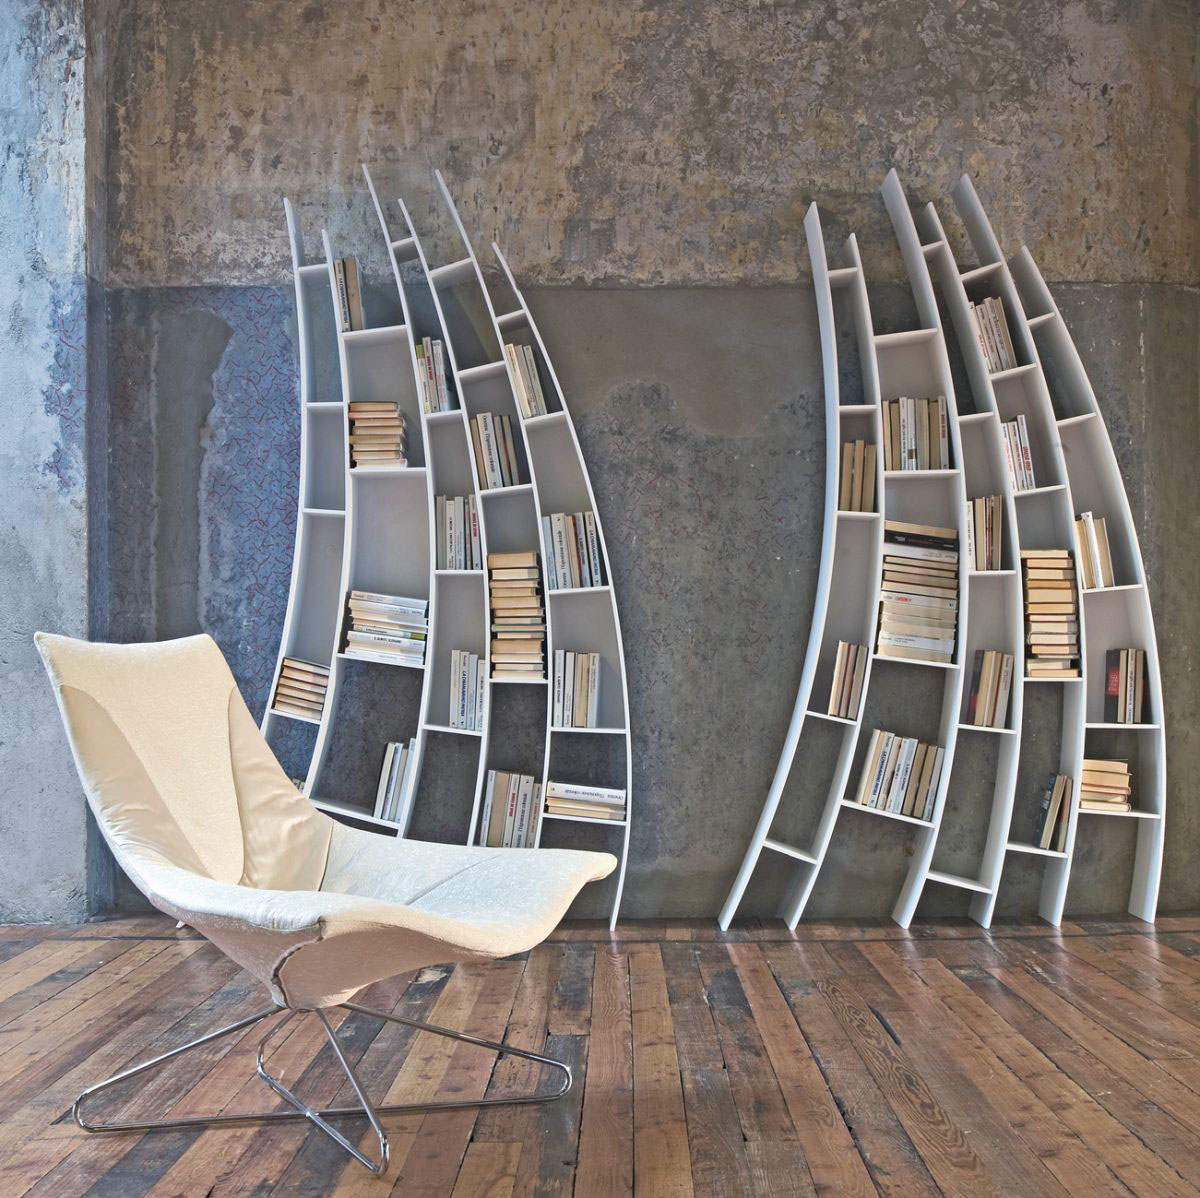 Surreal Bookshelves By Saba Italia Idesignarch Interior